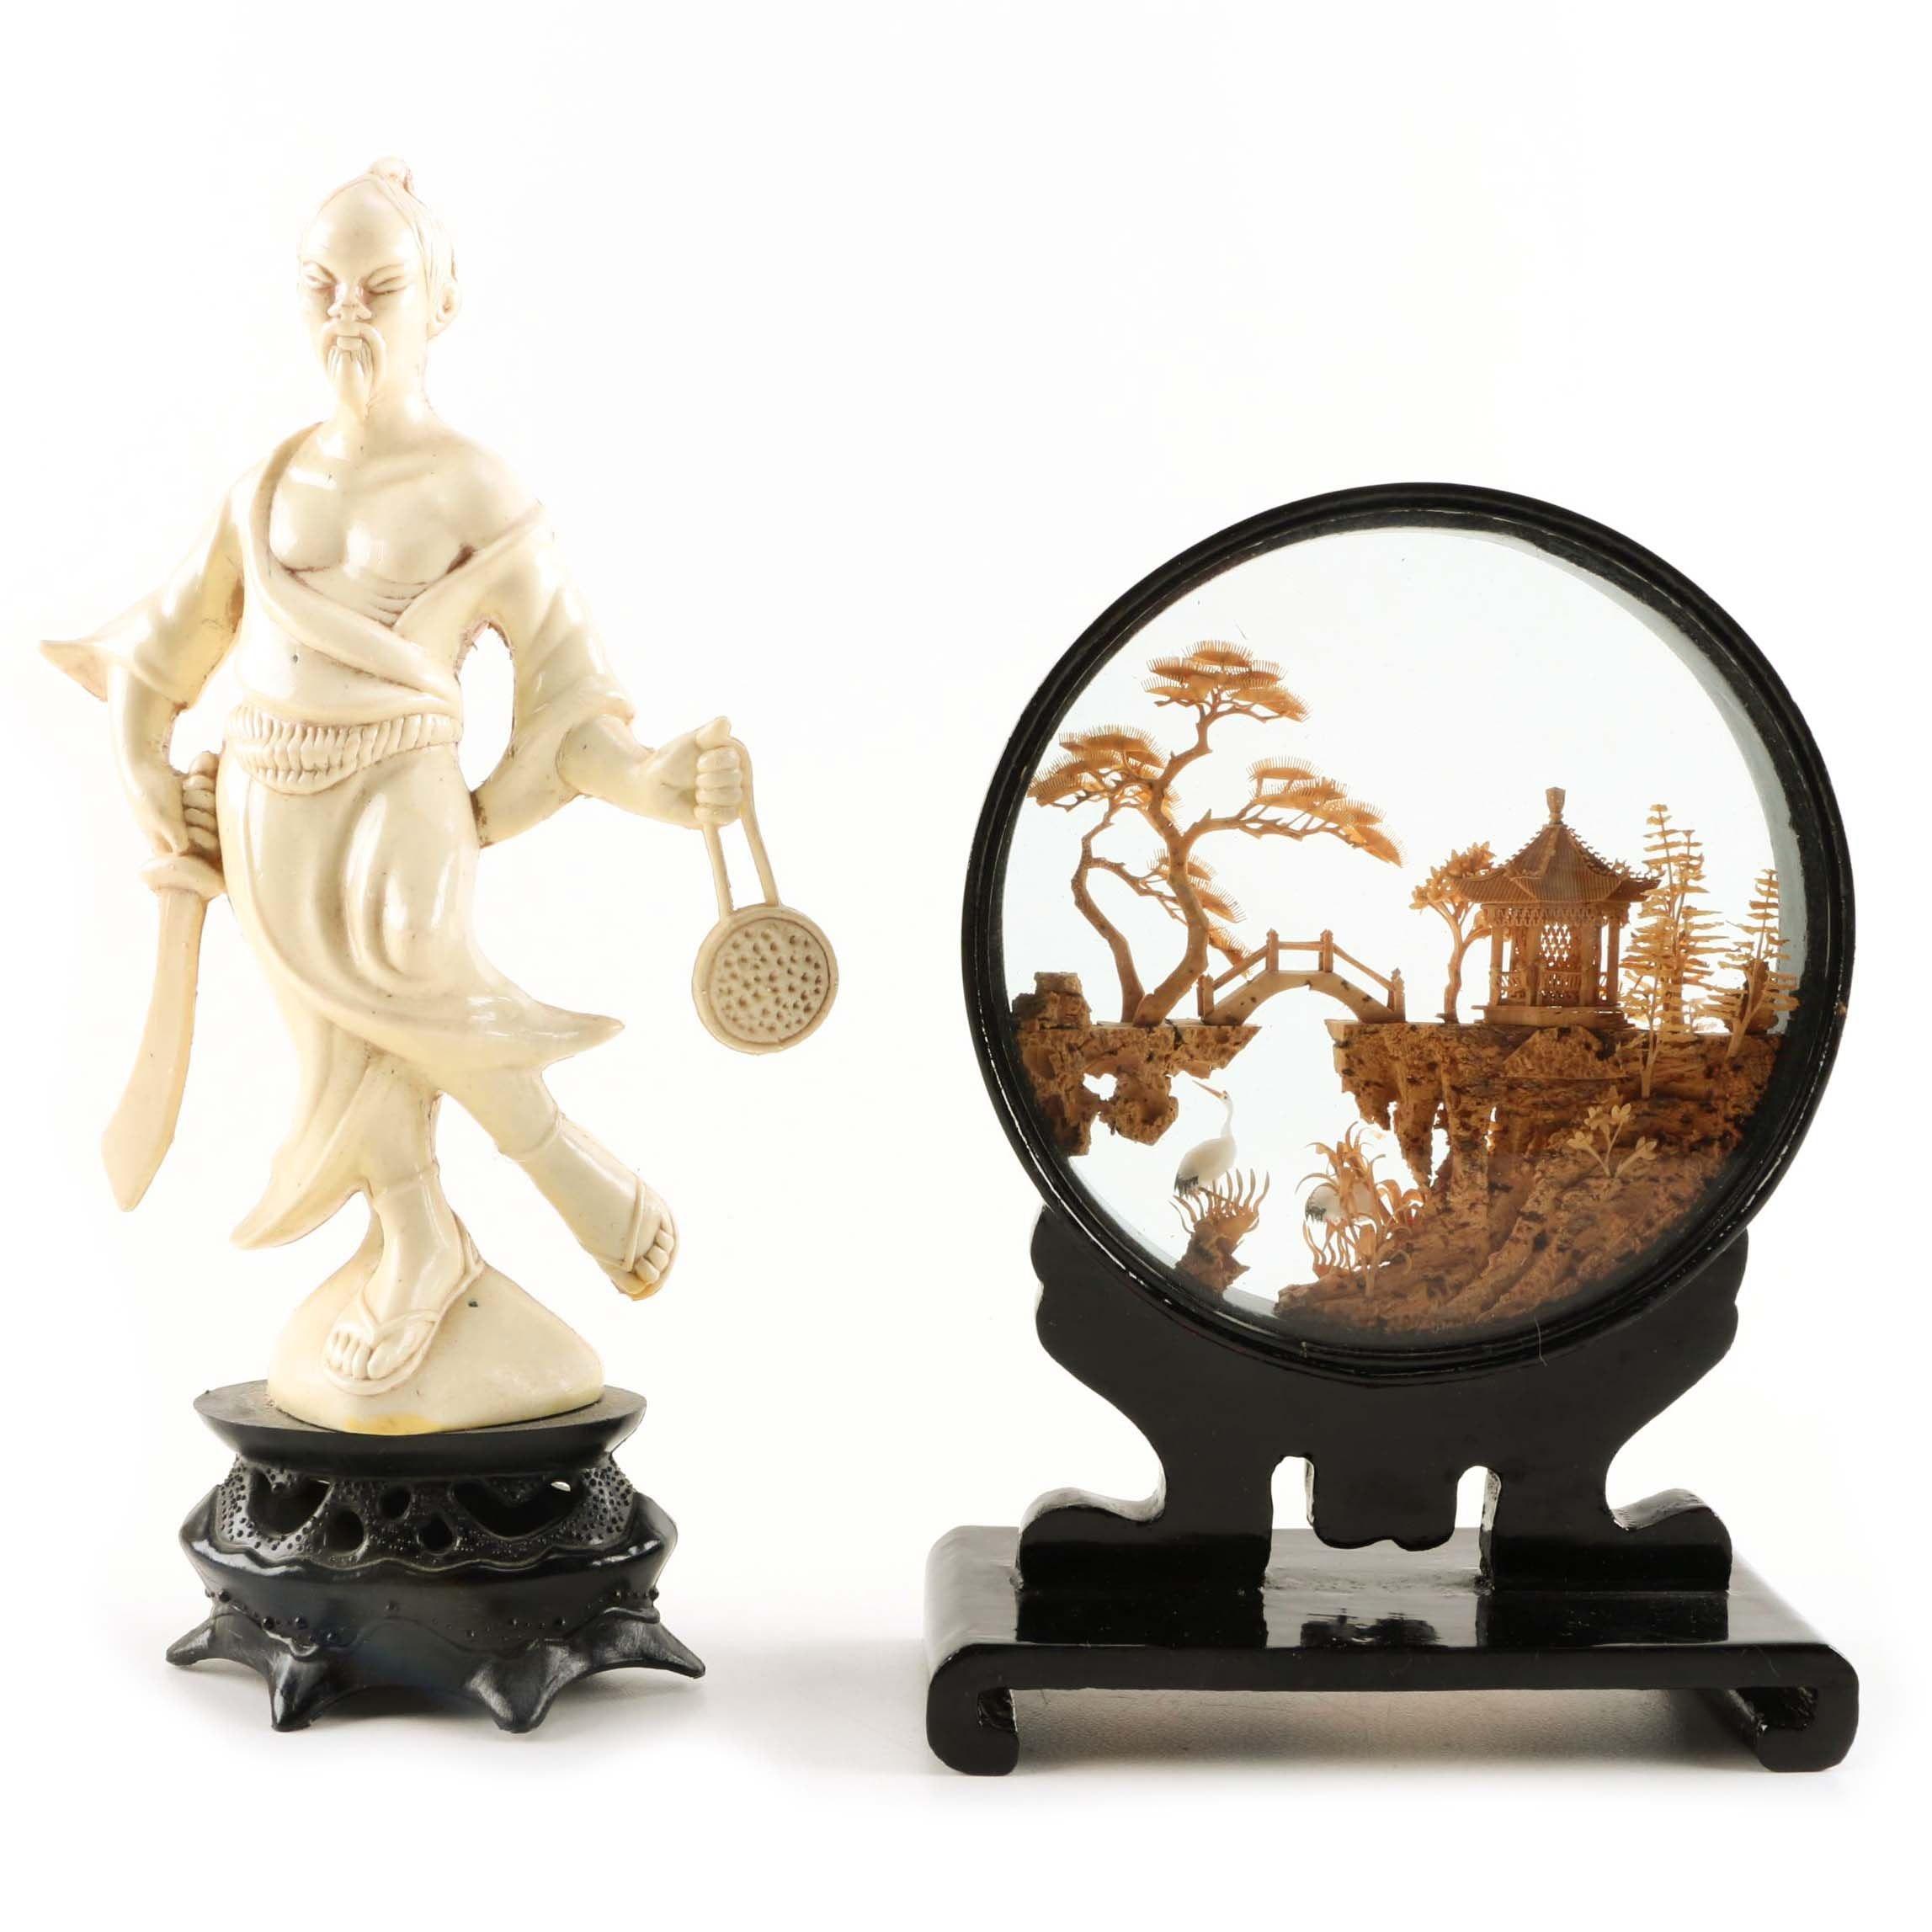 Chinese Diorama and Figurine